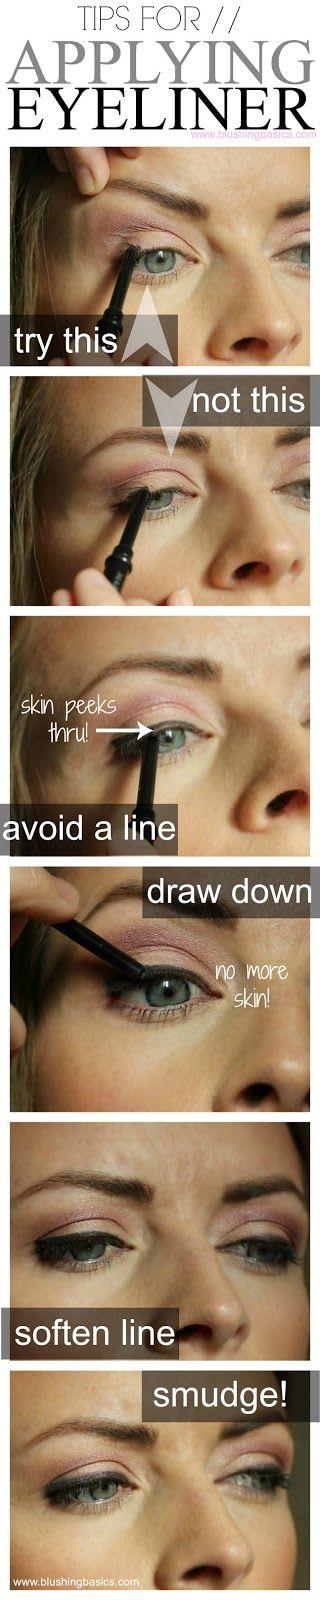 Tips for perfect pencil eyeliner via @Amelia R. Sánchez R. Sánchez Rosales Sánchez masdin Basics